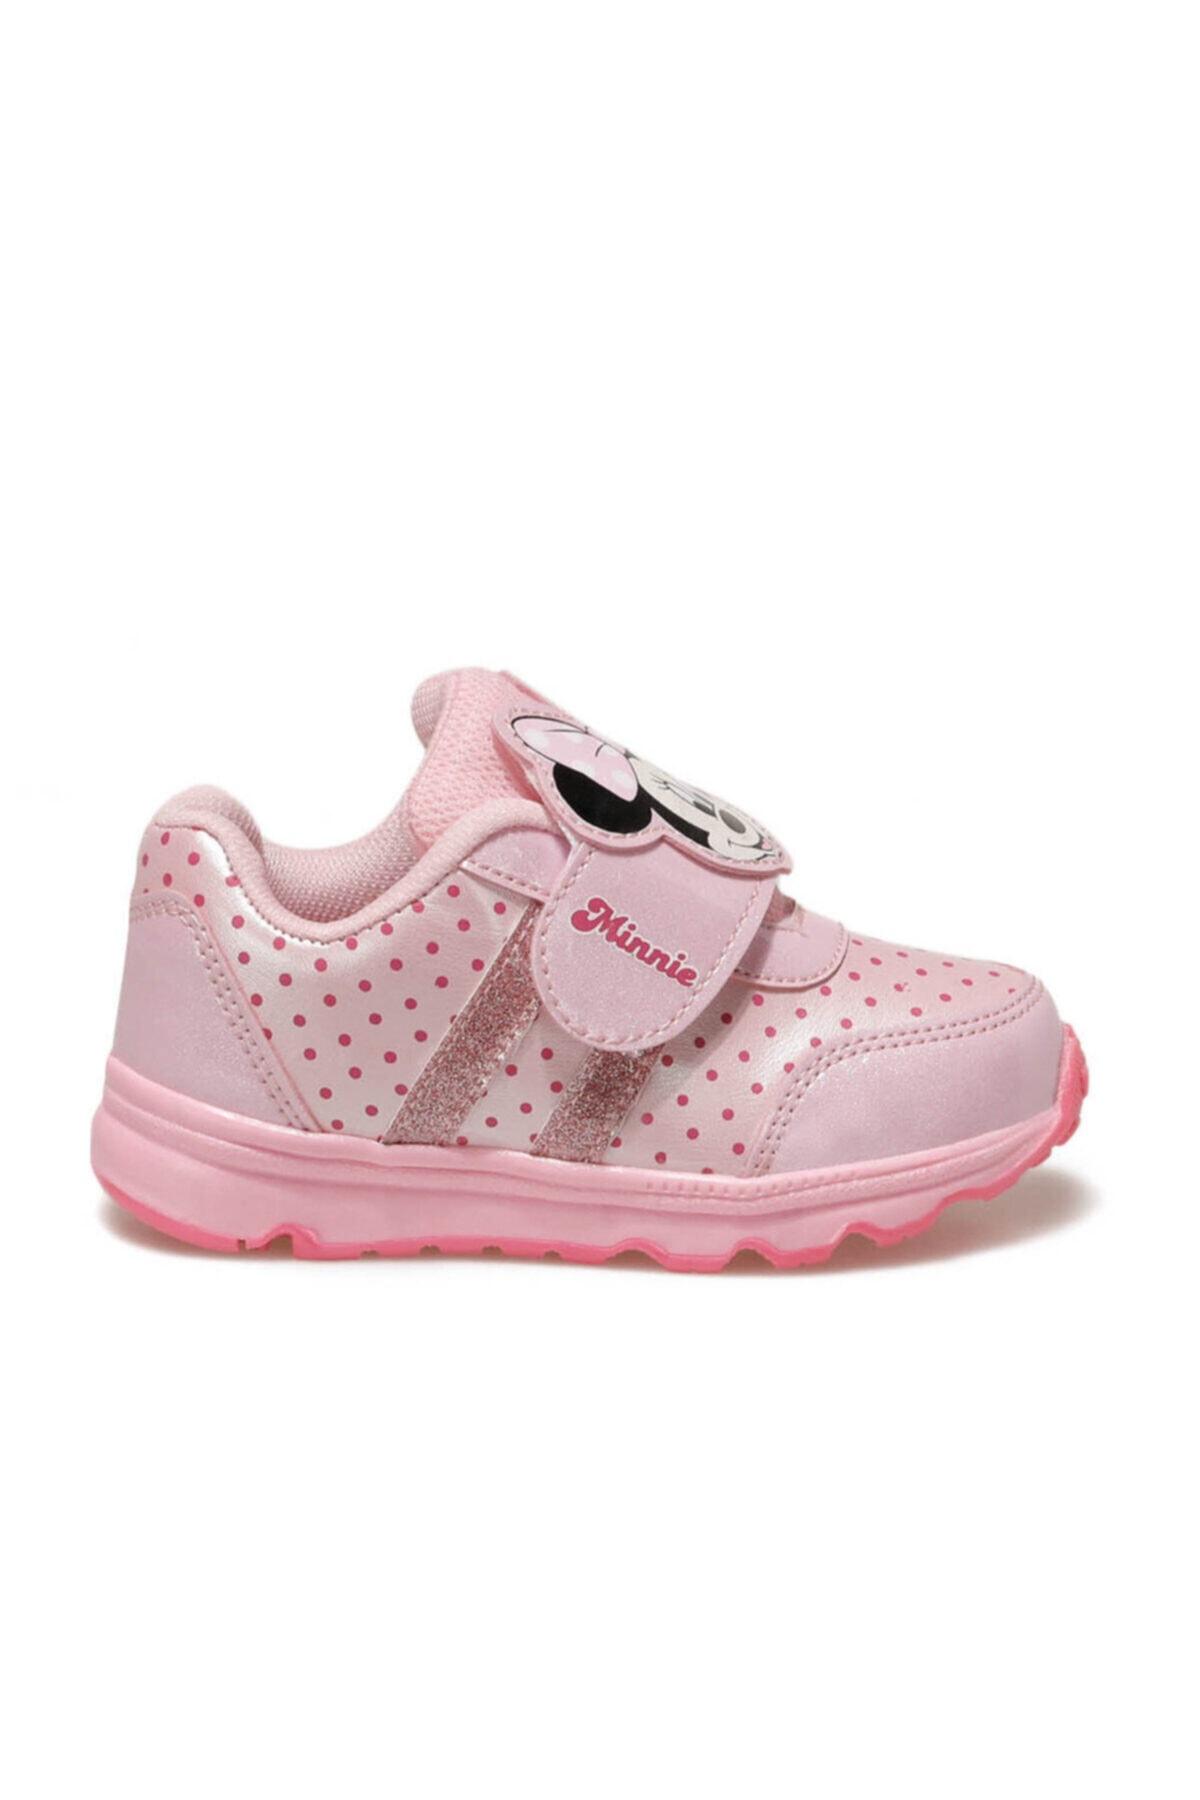 Mickey Mouse NIELY.B Pembe Kız Çocuk Ayakkabı 100561505 2